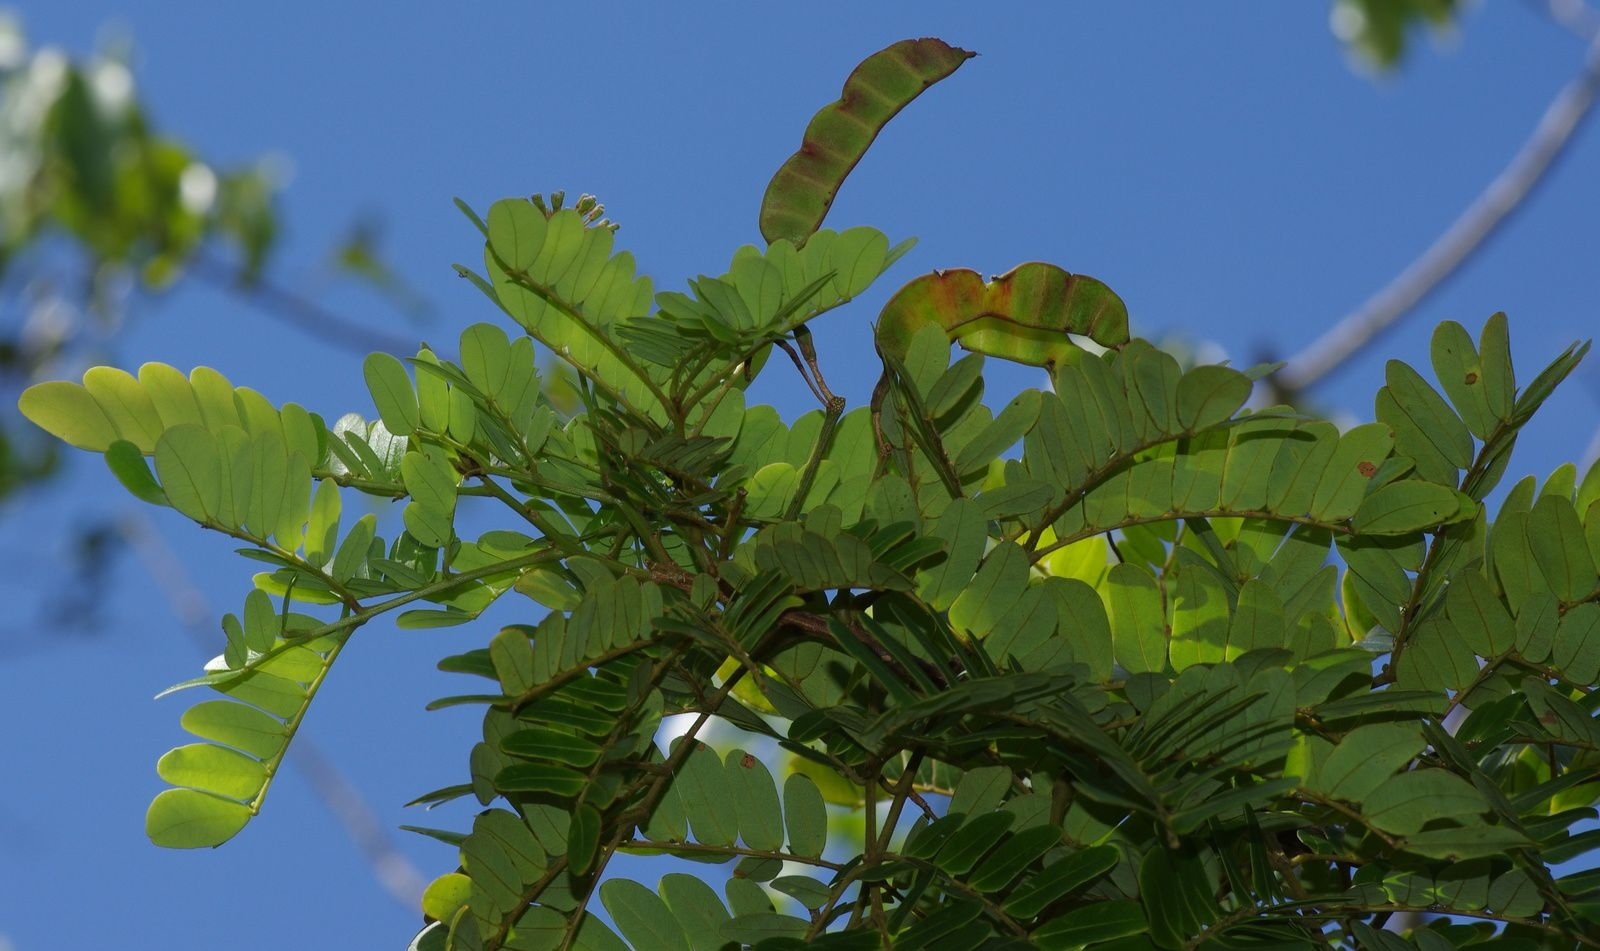 Hydrochorea corymbosa